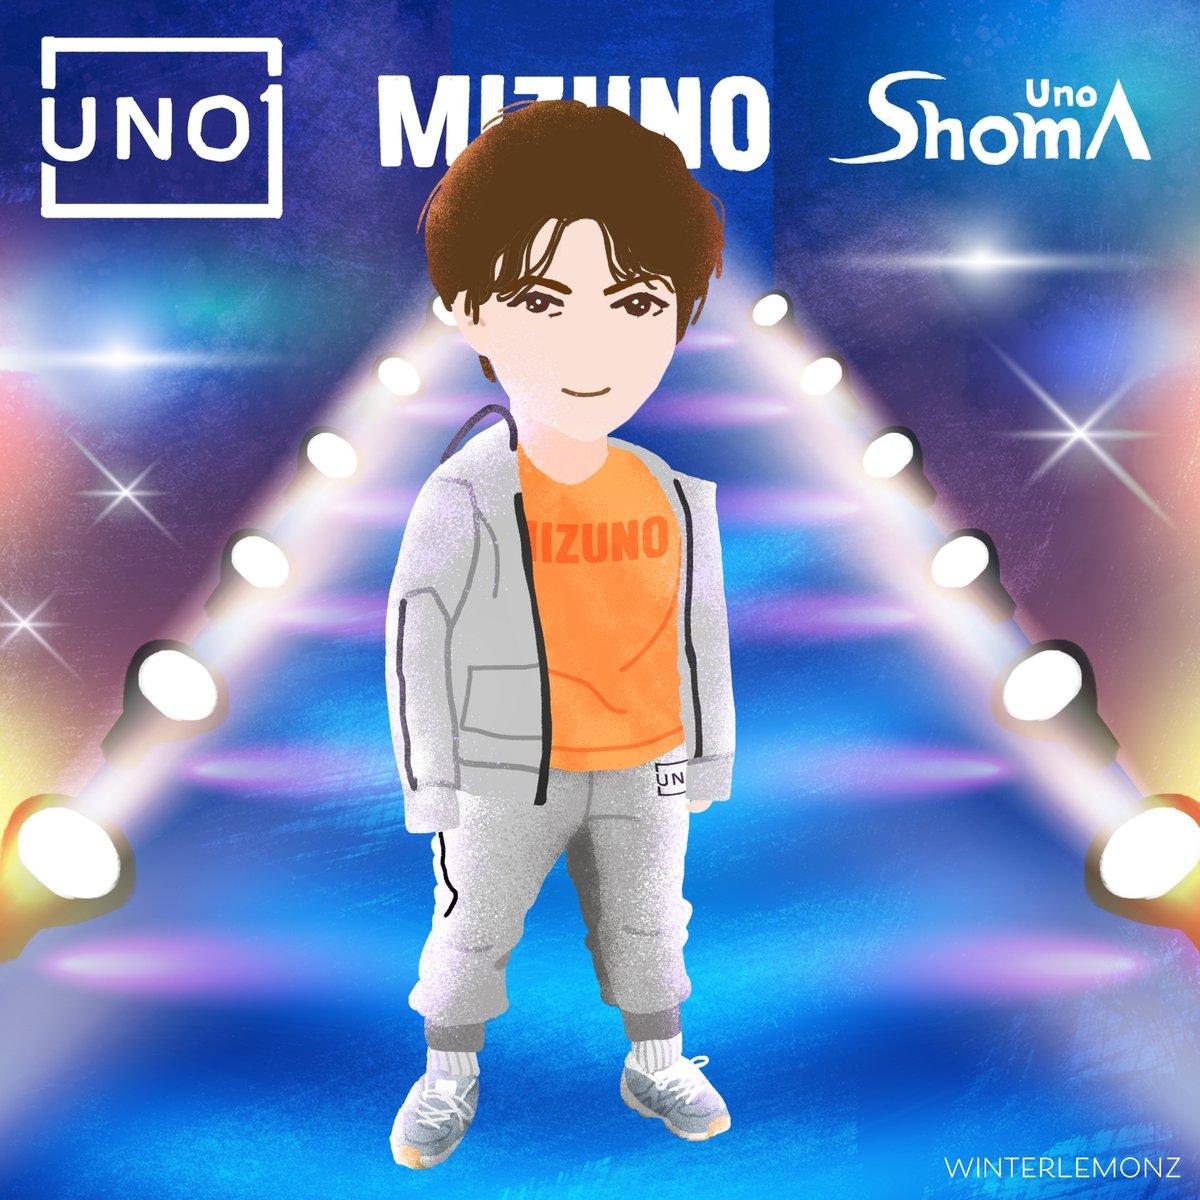 My sleeves are a little too long.  #宇野昌磨 #shomauno #MIZUNO pic.twitter.com/536yOfLPxU